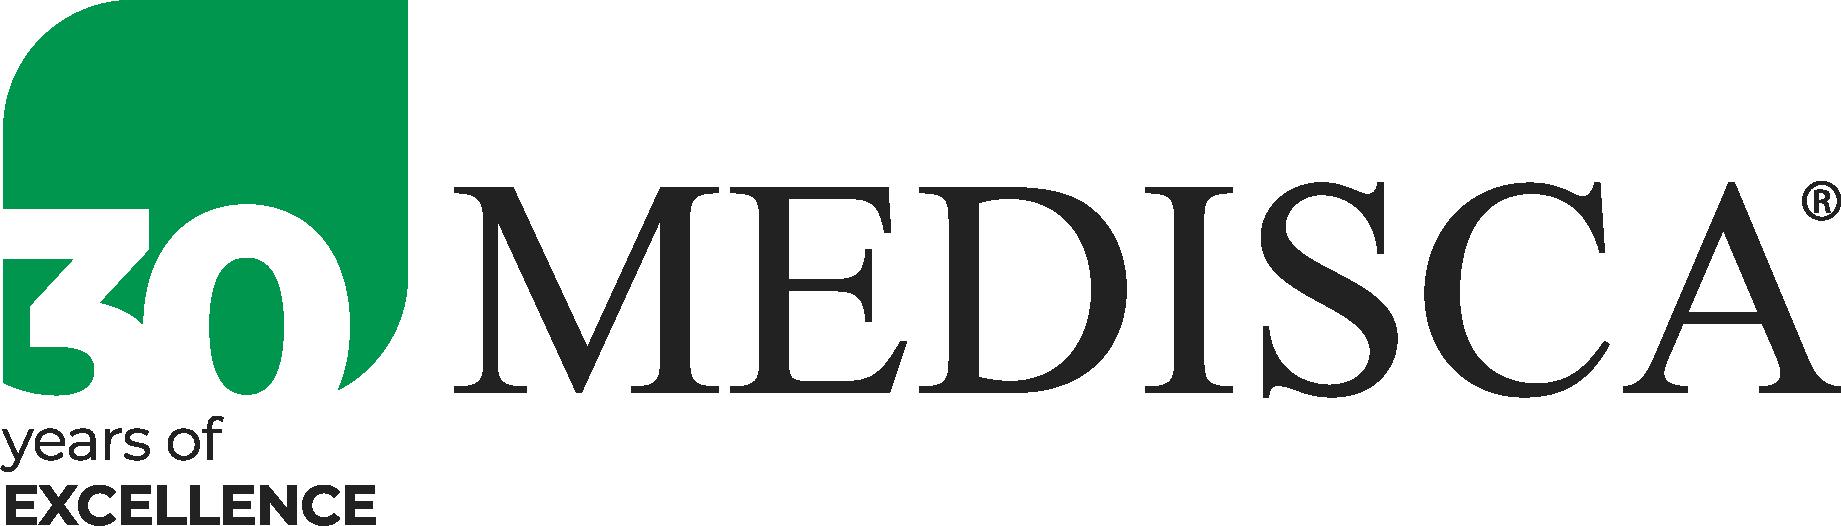 Medisca 30